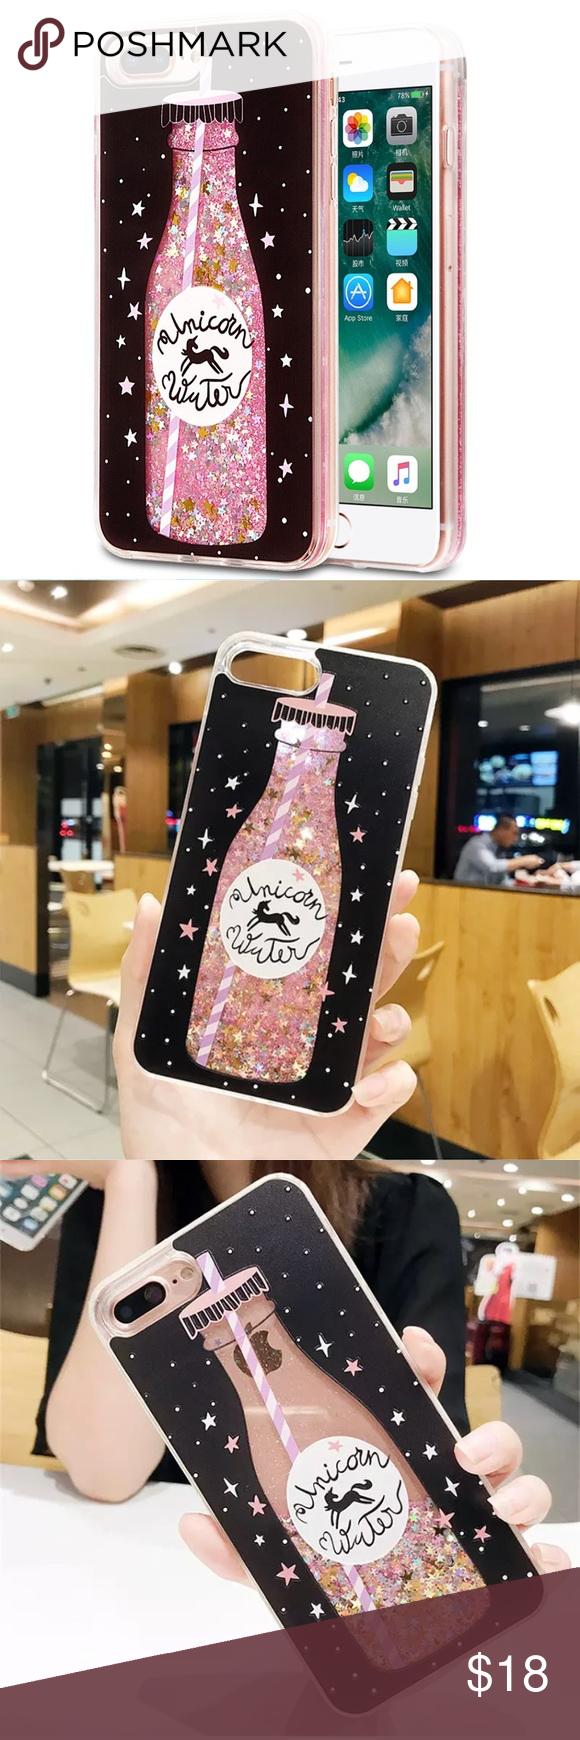 promo code 2f37f 01d6f Unicorn Water Glitter Quicksand iPhone 8 Plus Case Both cases fit ...